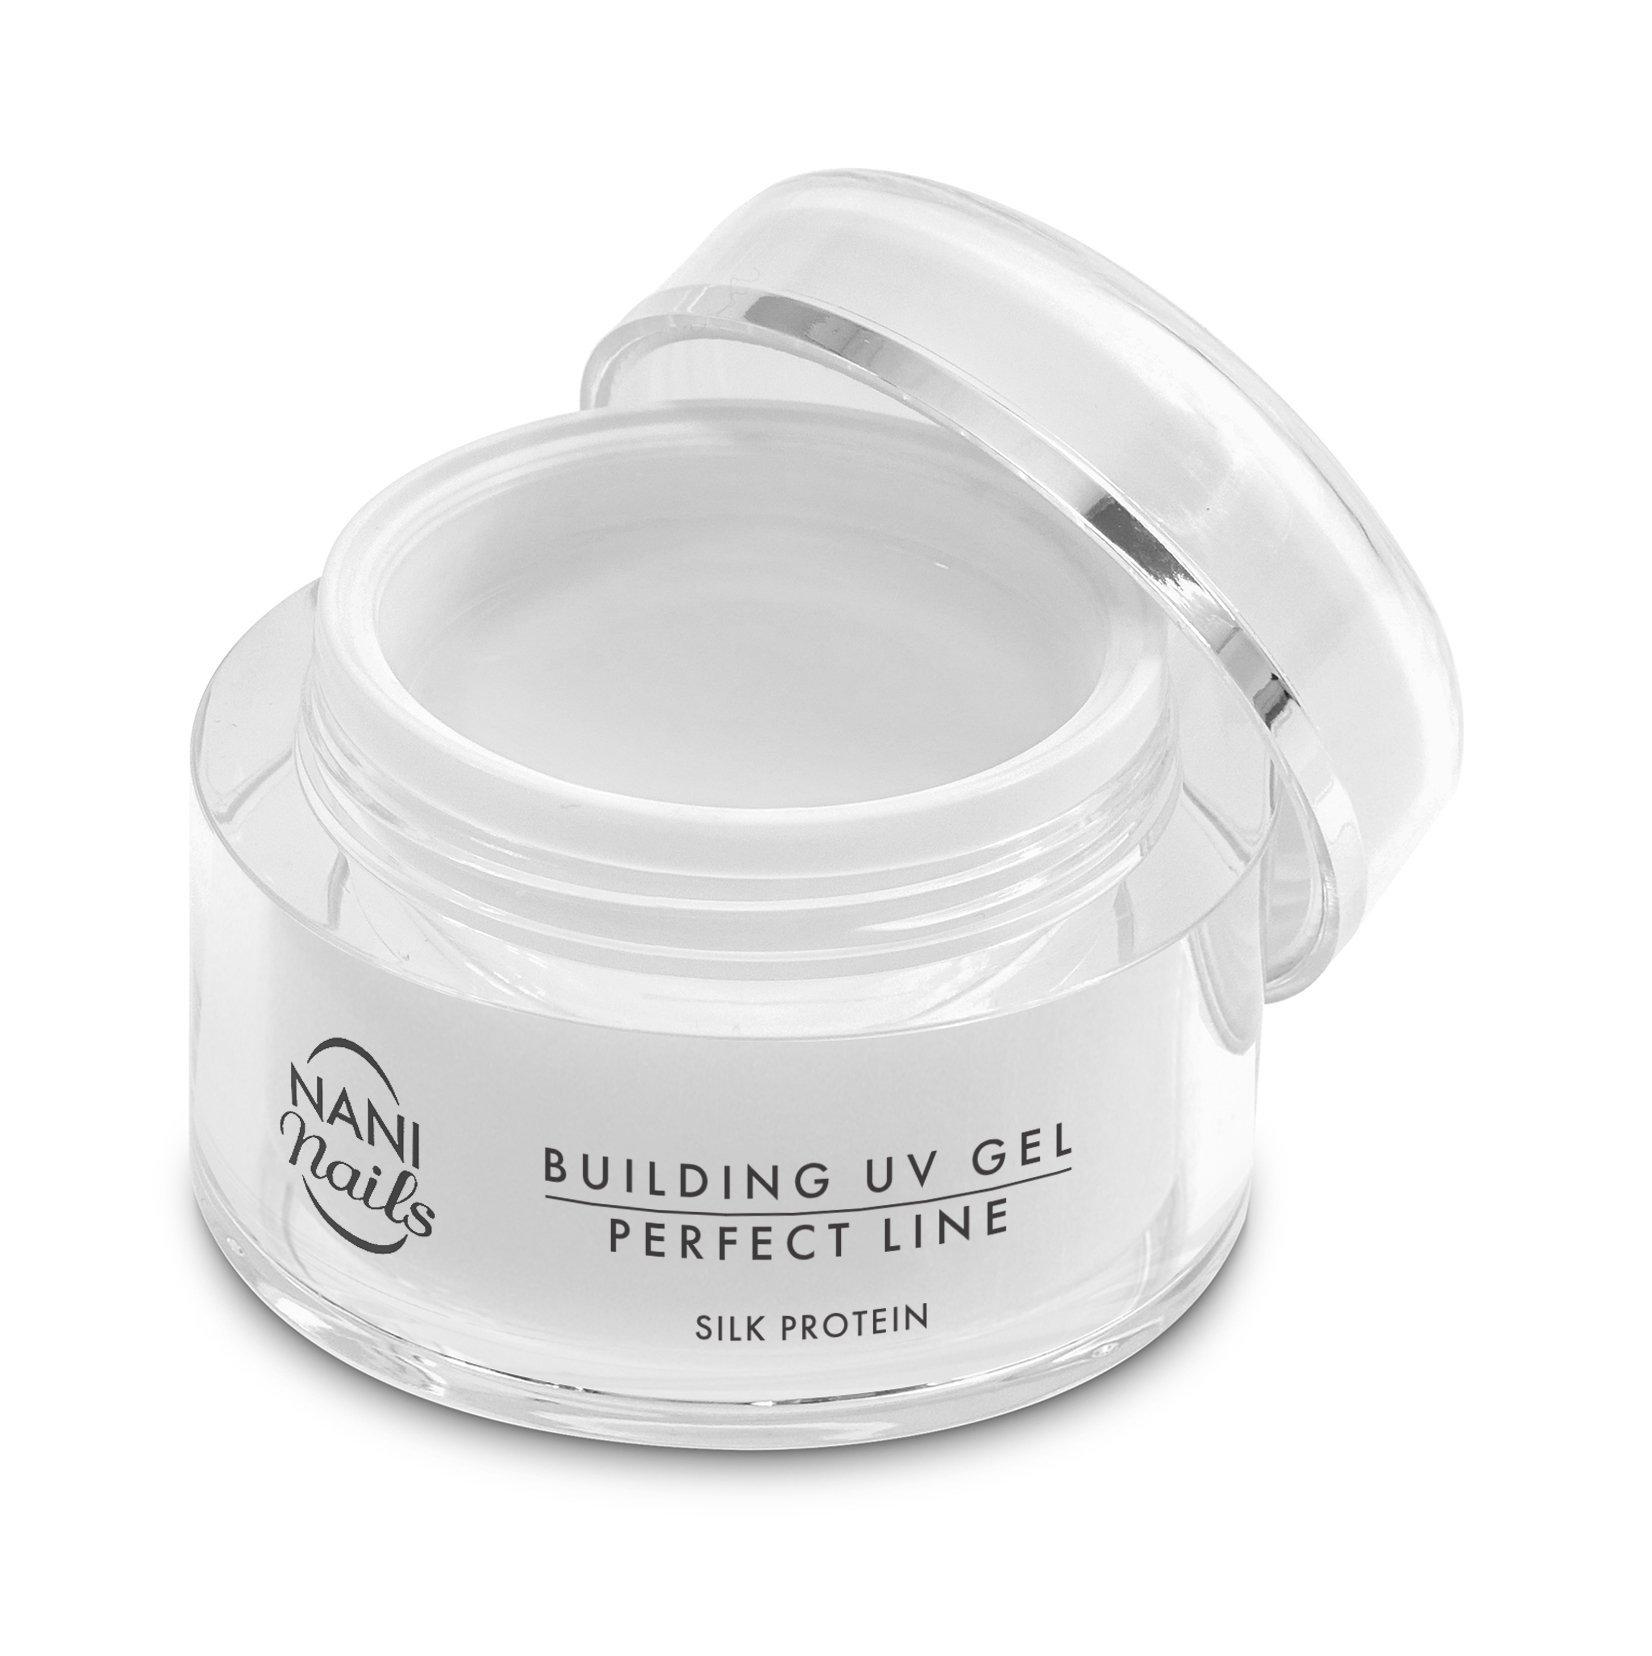 NANI UV gél Perfect Line 50 ml - Silk Protein